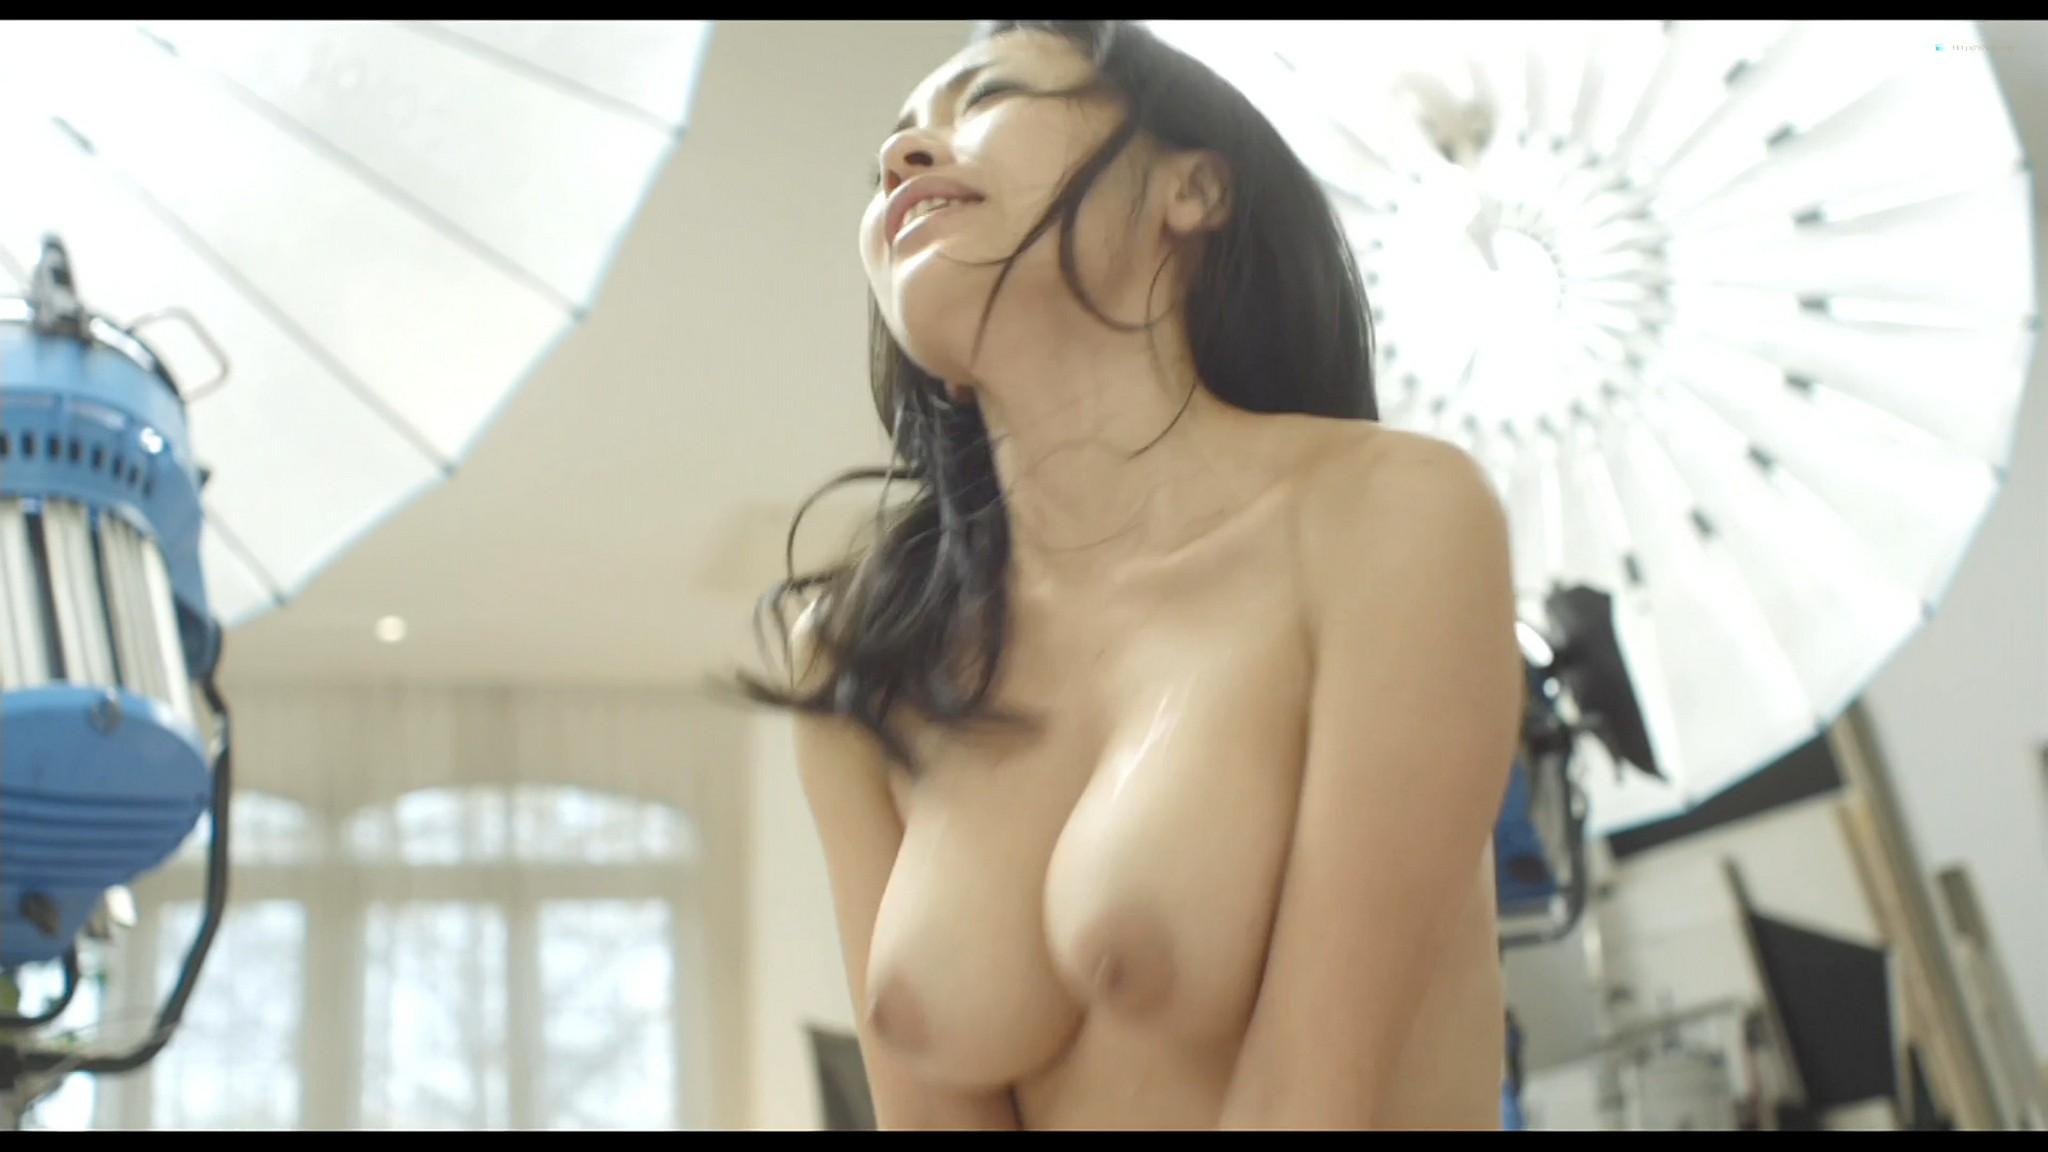 Megumi Kagurazaka nude full frontal Makoto Togashi nude too Guilty of Romance JP 2011 HD 1080p BluRay 15